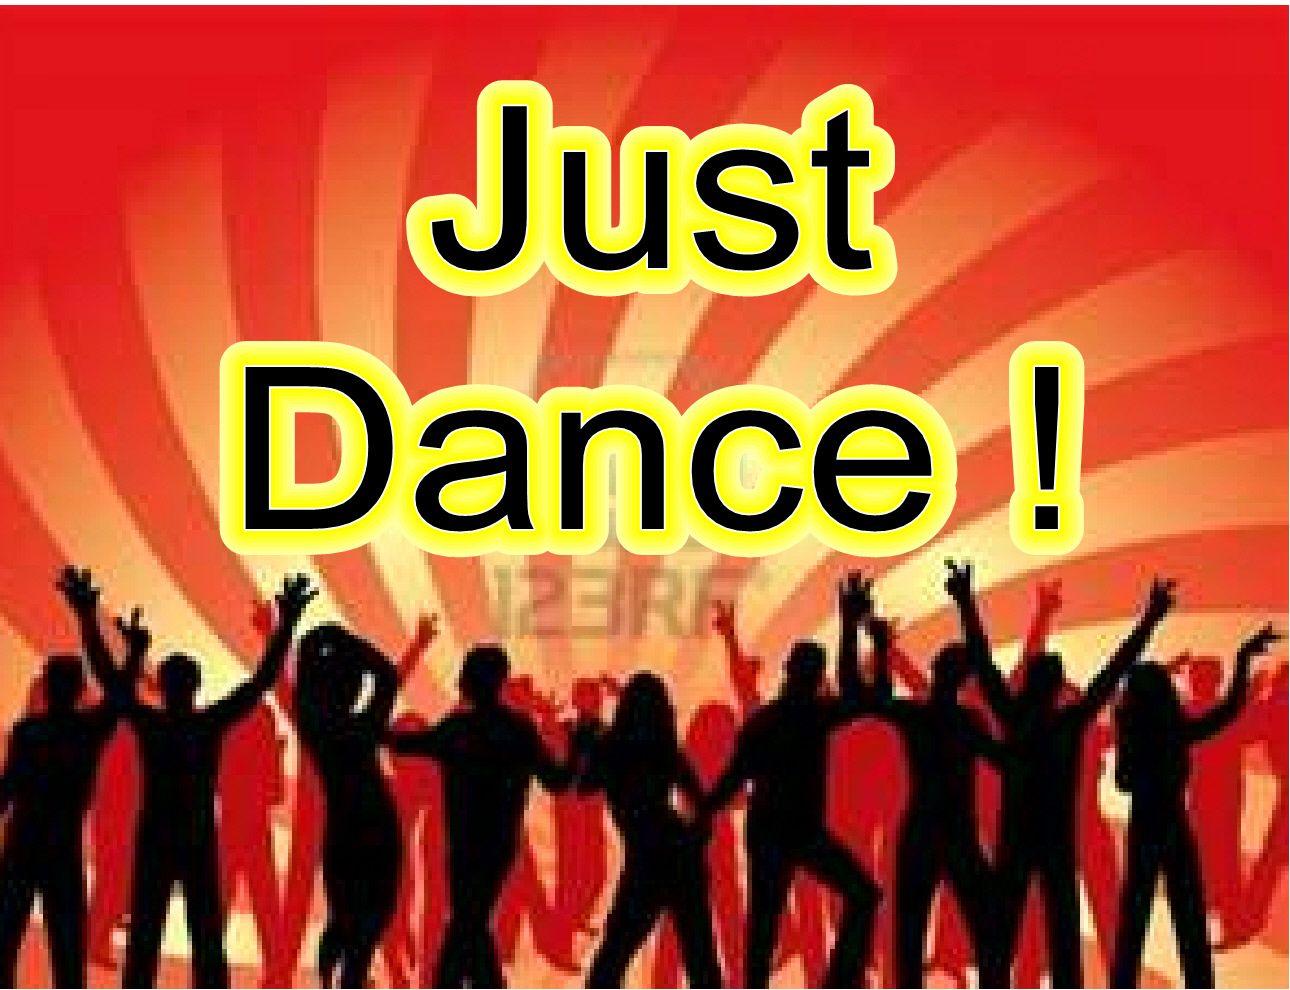 Dances for singles Bay Area Singles Dance, Where Friends Meet!